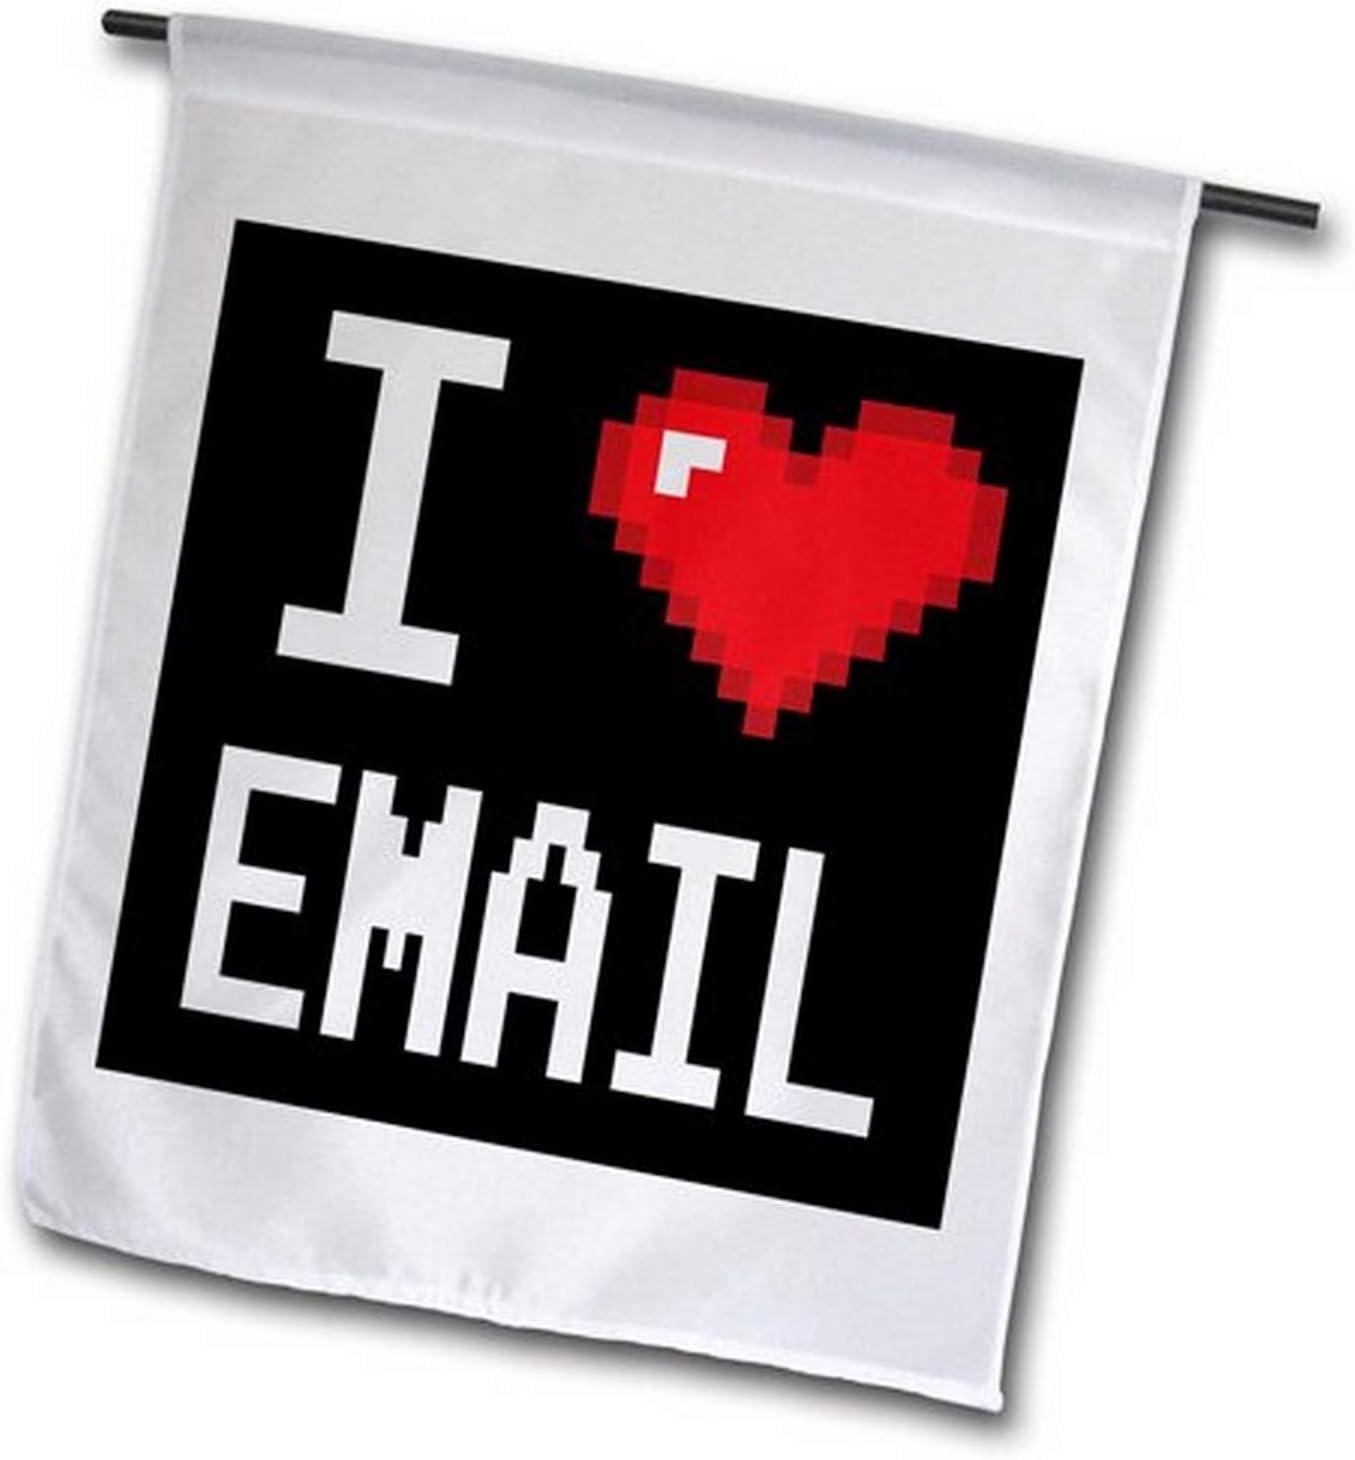 3dRose fl_118881_1 Geeky Old School Pixelated Pixels 8-Bit I Heart I Love Email Garden Flag, 12 by 18